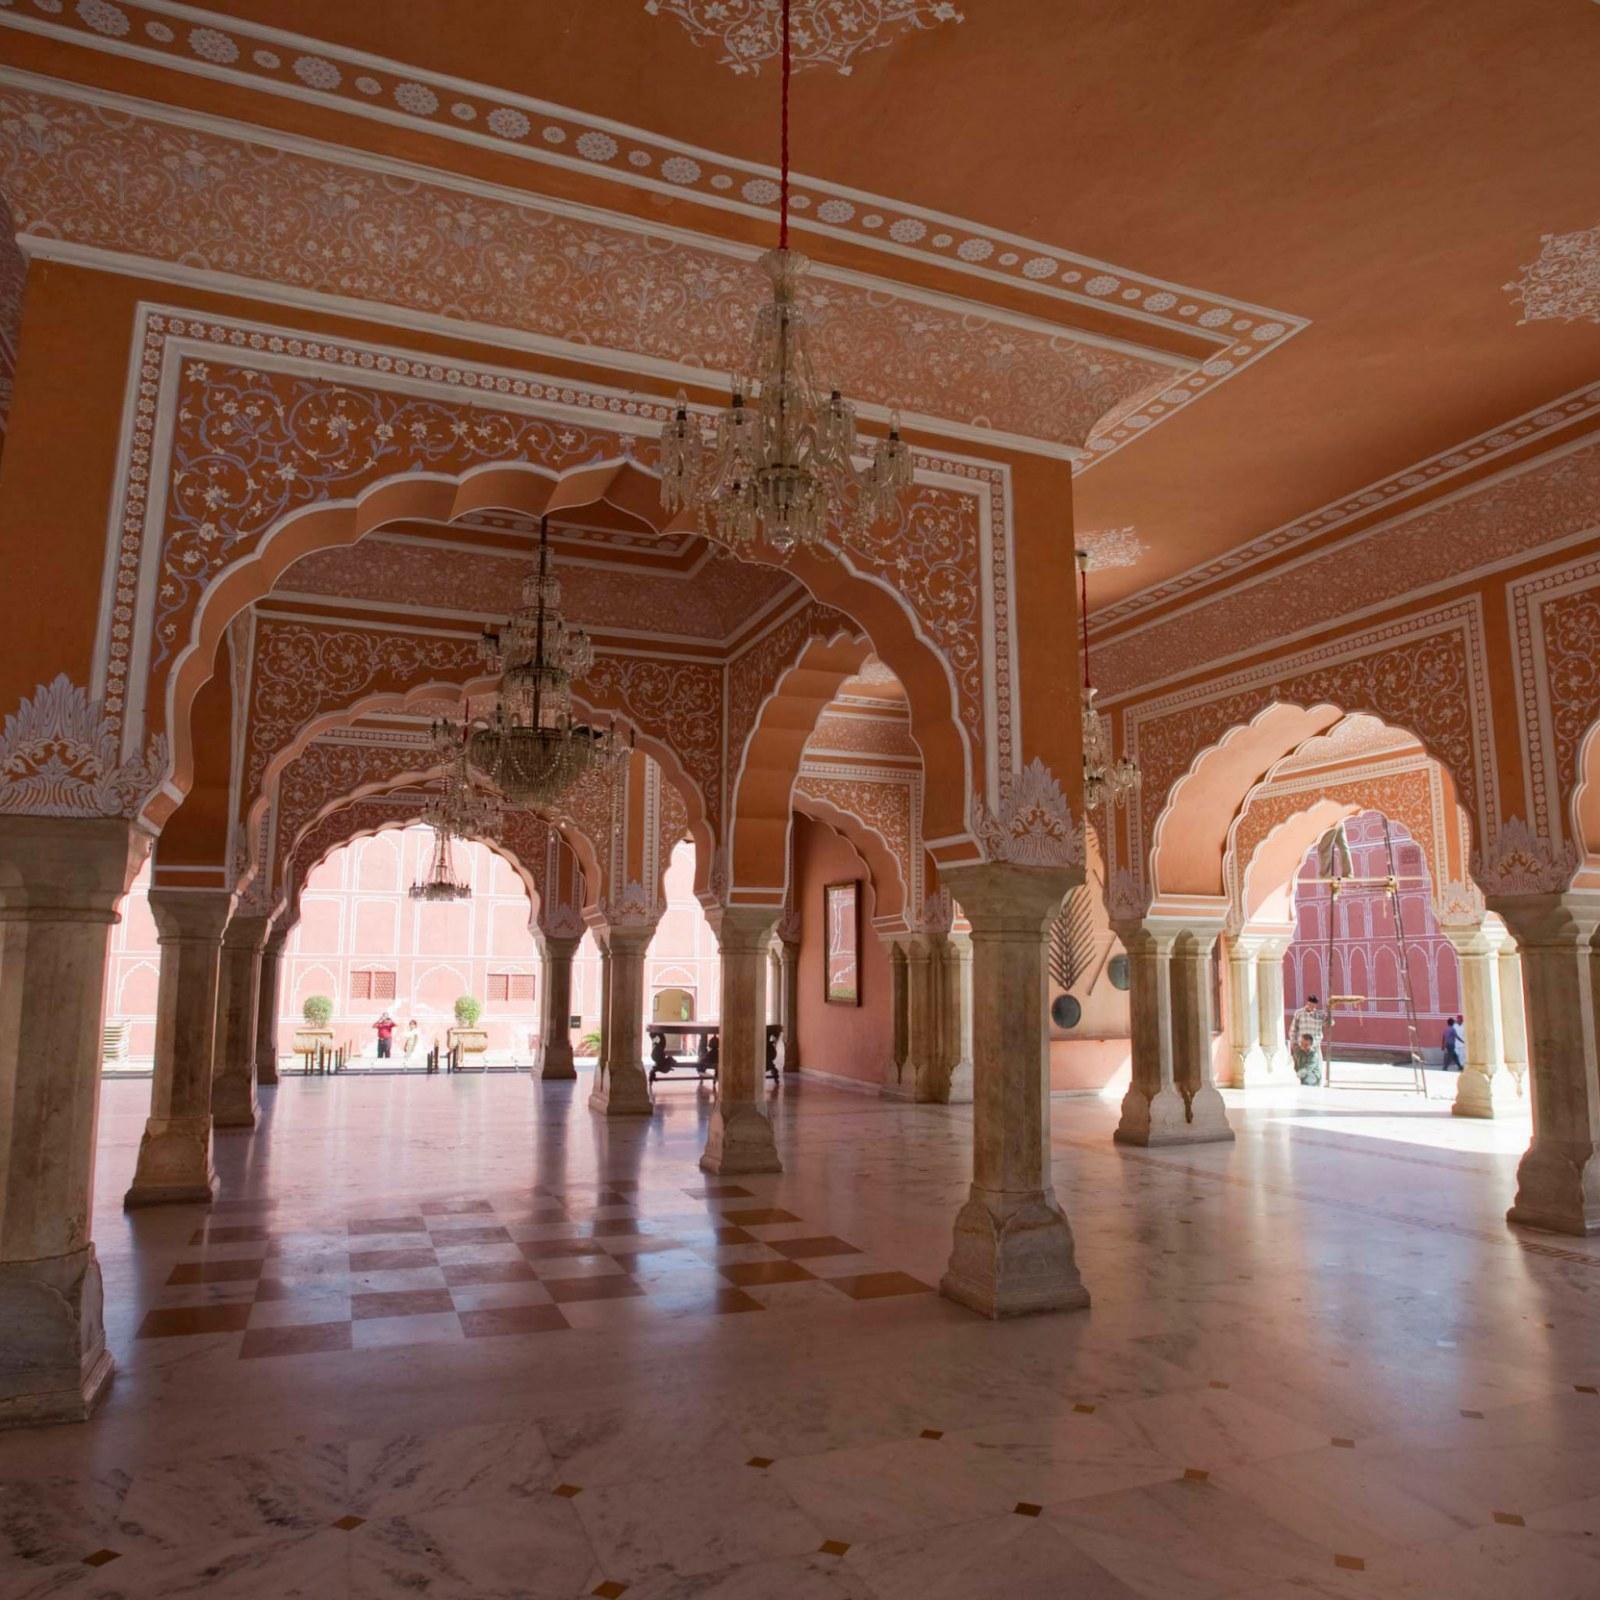 City Palace Of Jaipur Home Of Maharaja Sawai Padmanabh Singh On